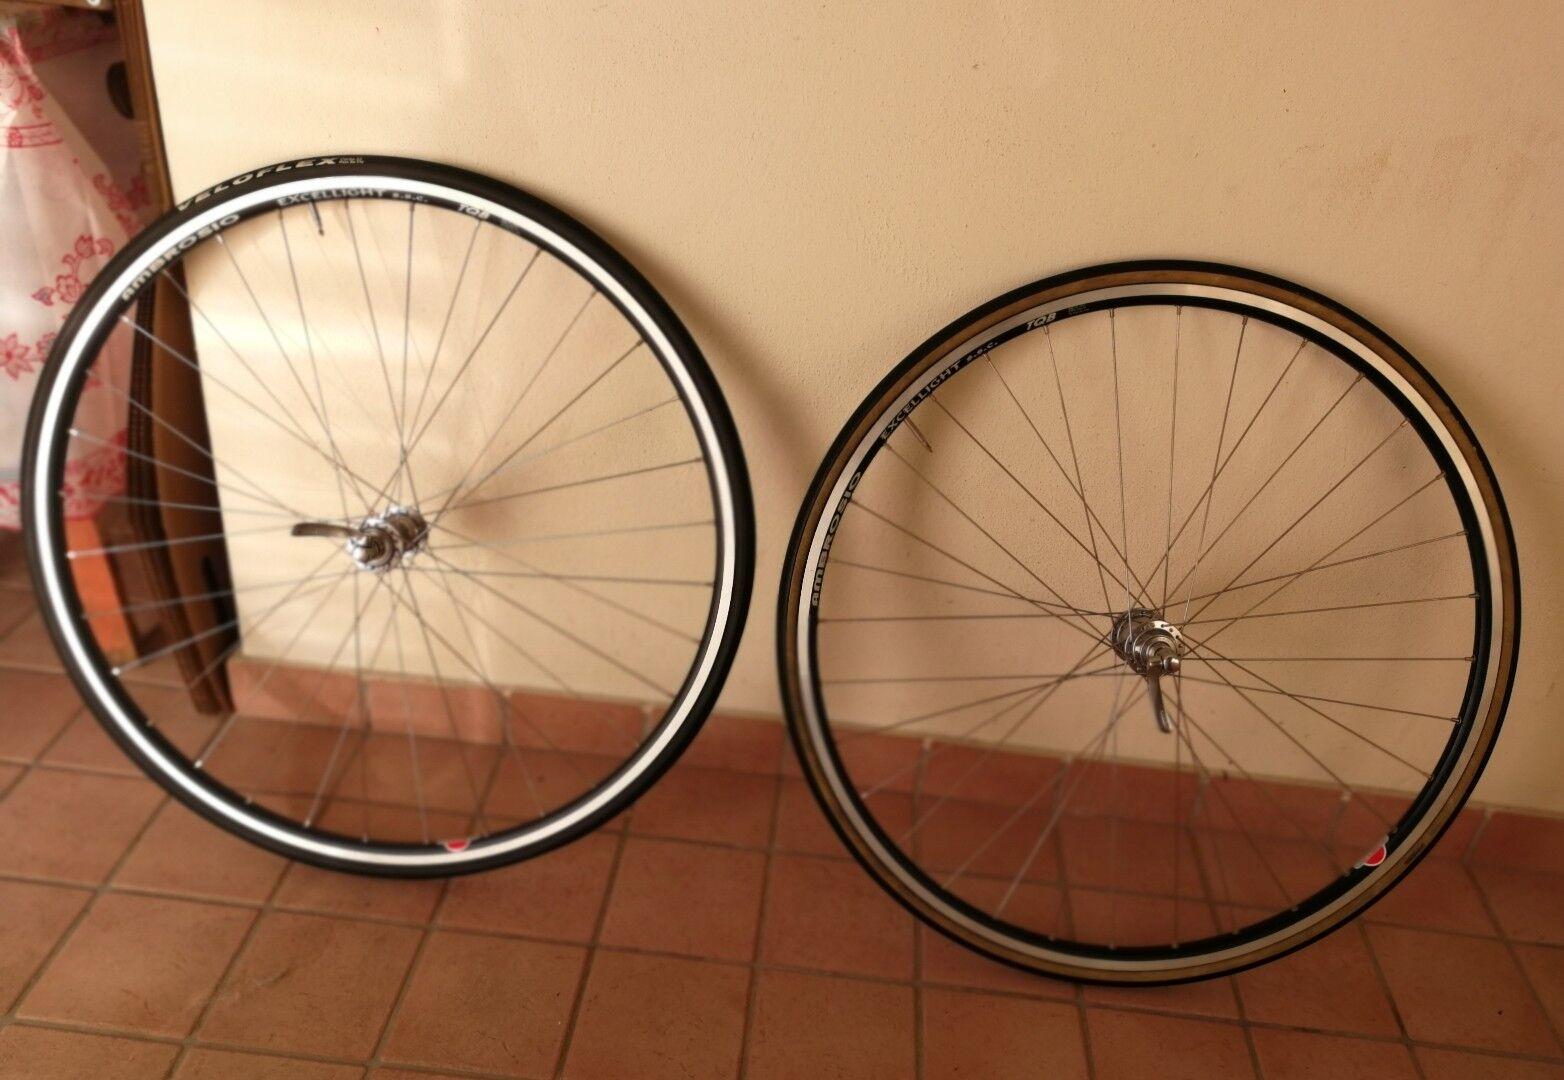 Shimano Dura-Ace 7800 Road Wheelsts, ruote complete